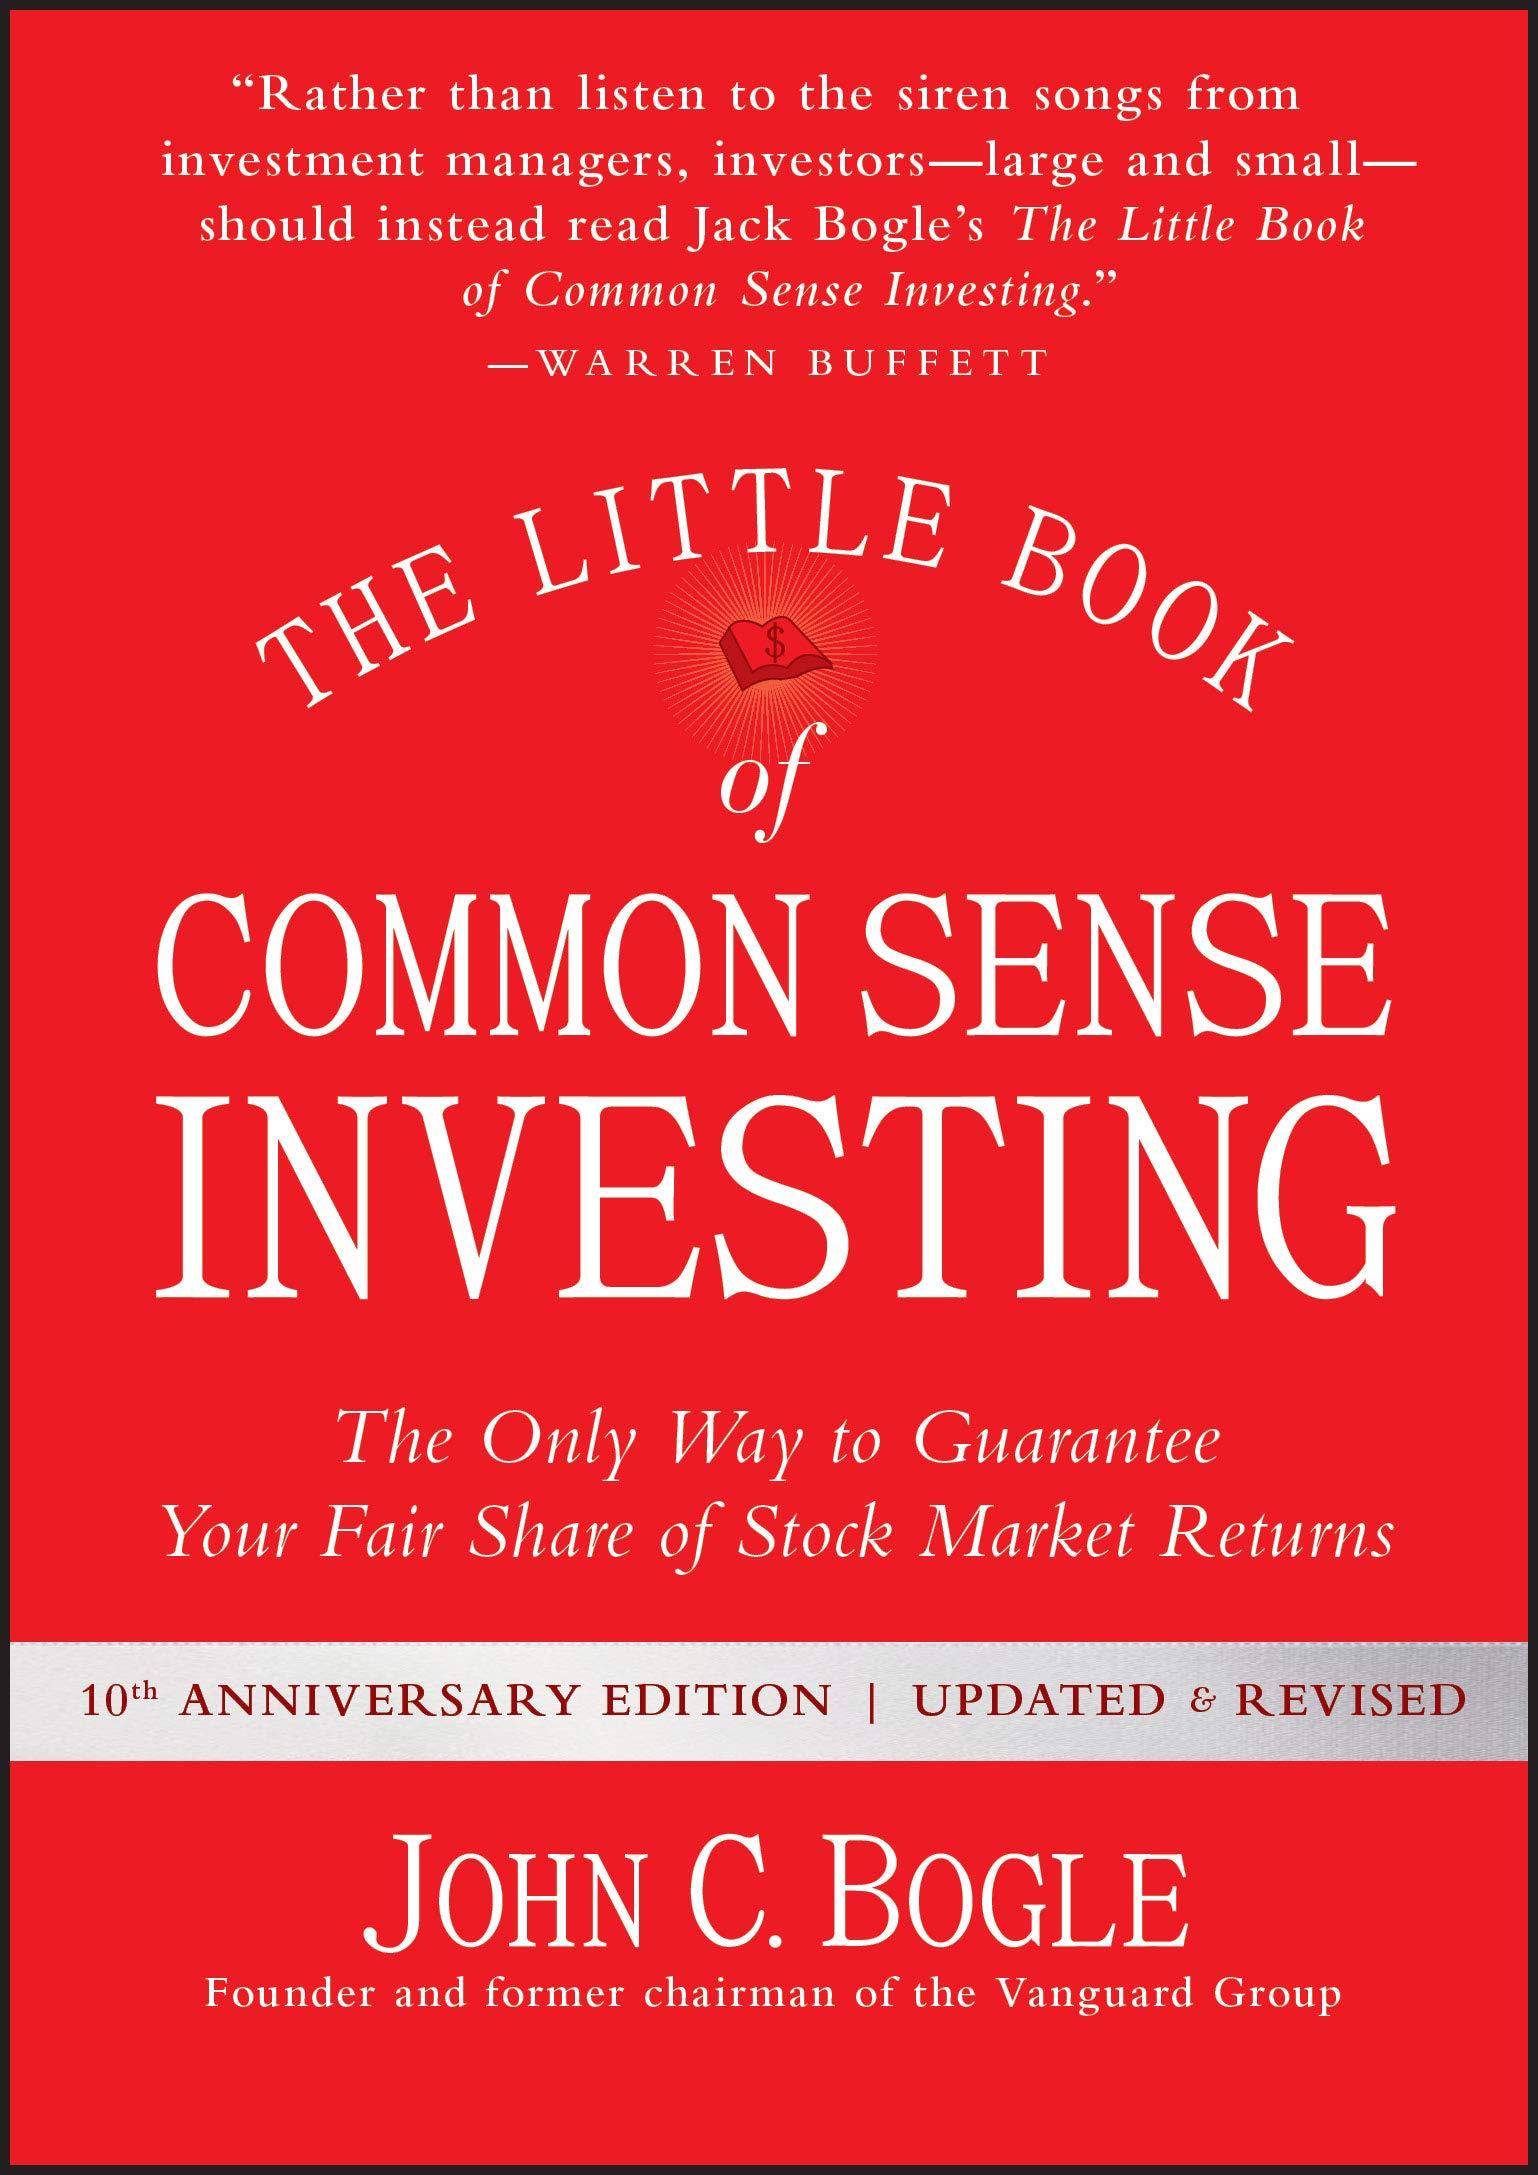 John C Bogle - The Little Book of Common Sense Investing